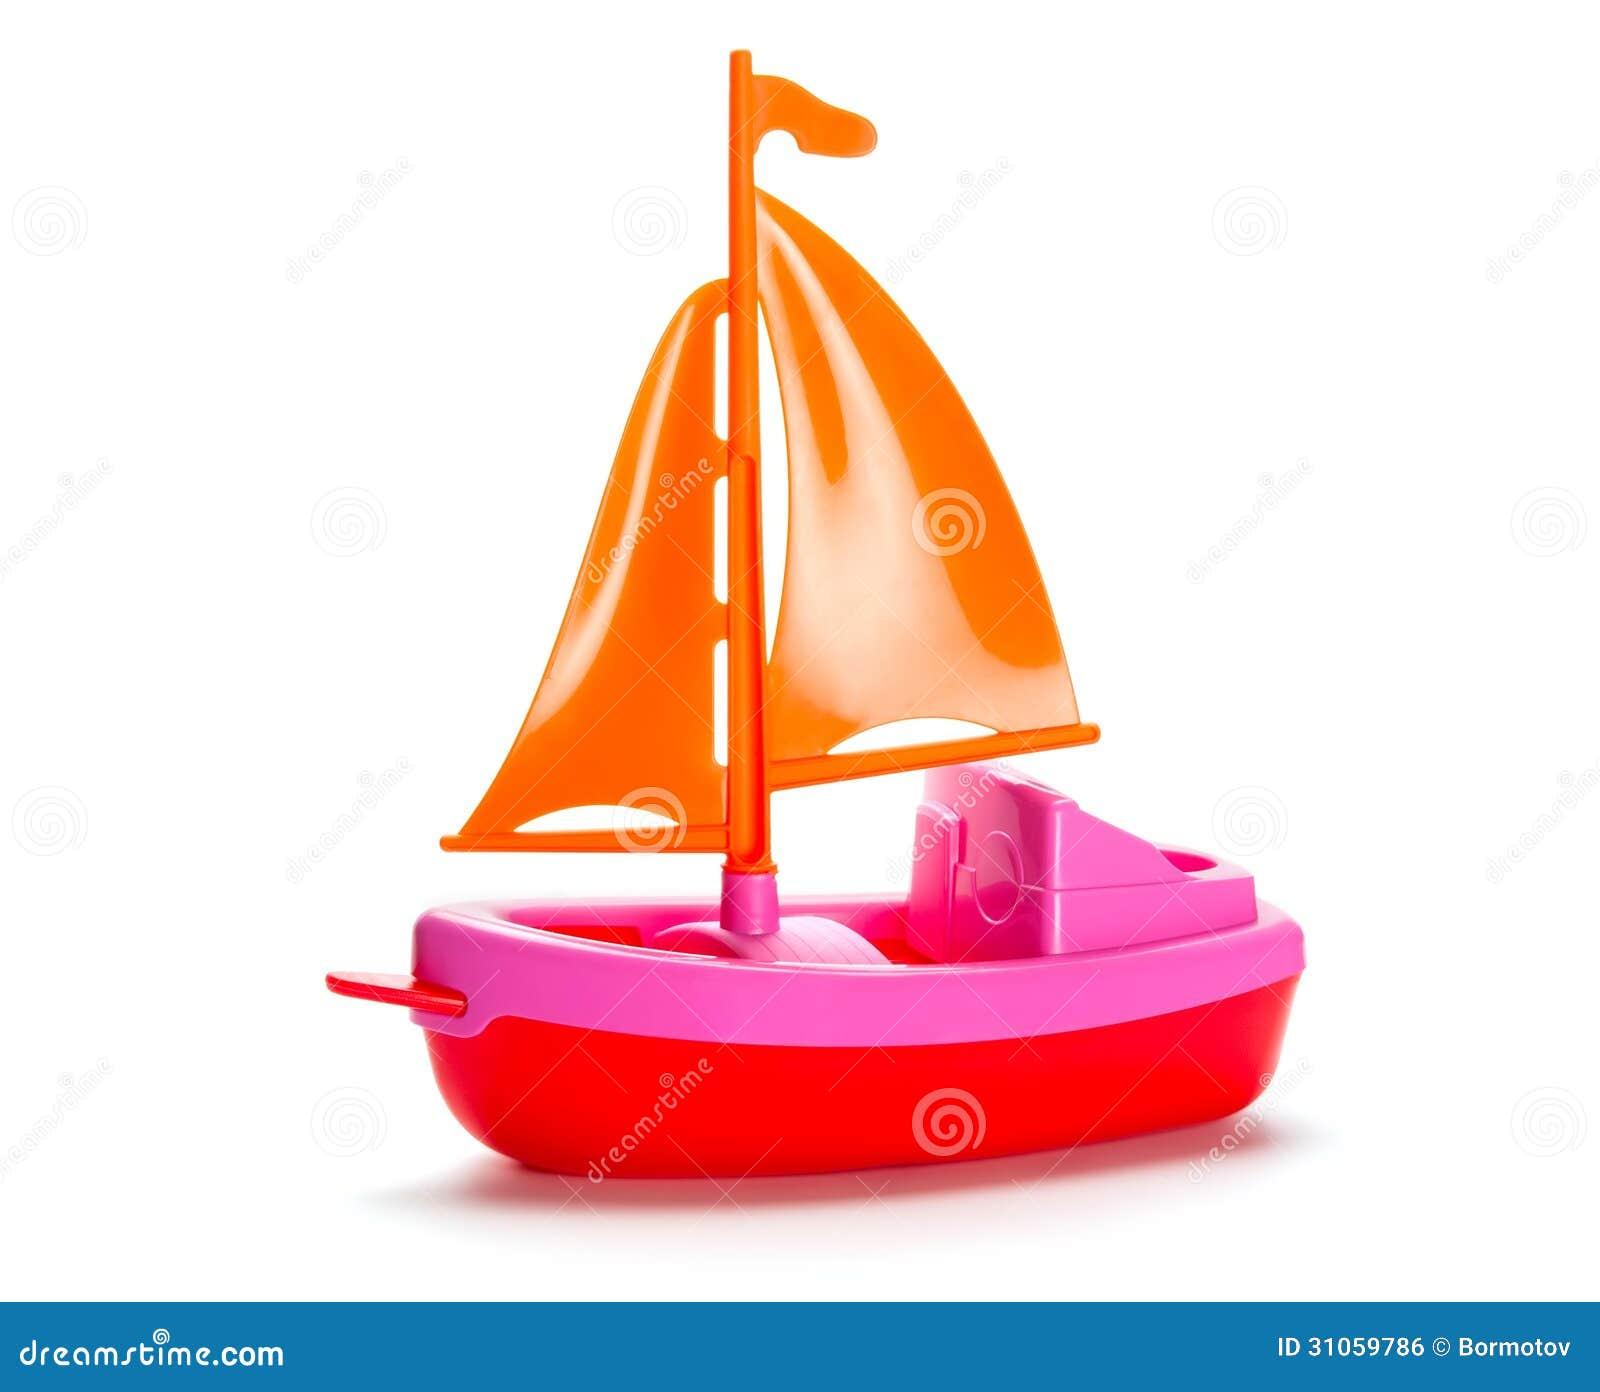 Viking Boat Model Royalty Free Stock Photography - Image: 35439917